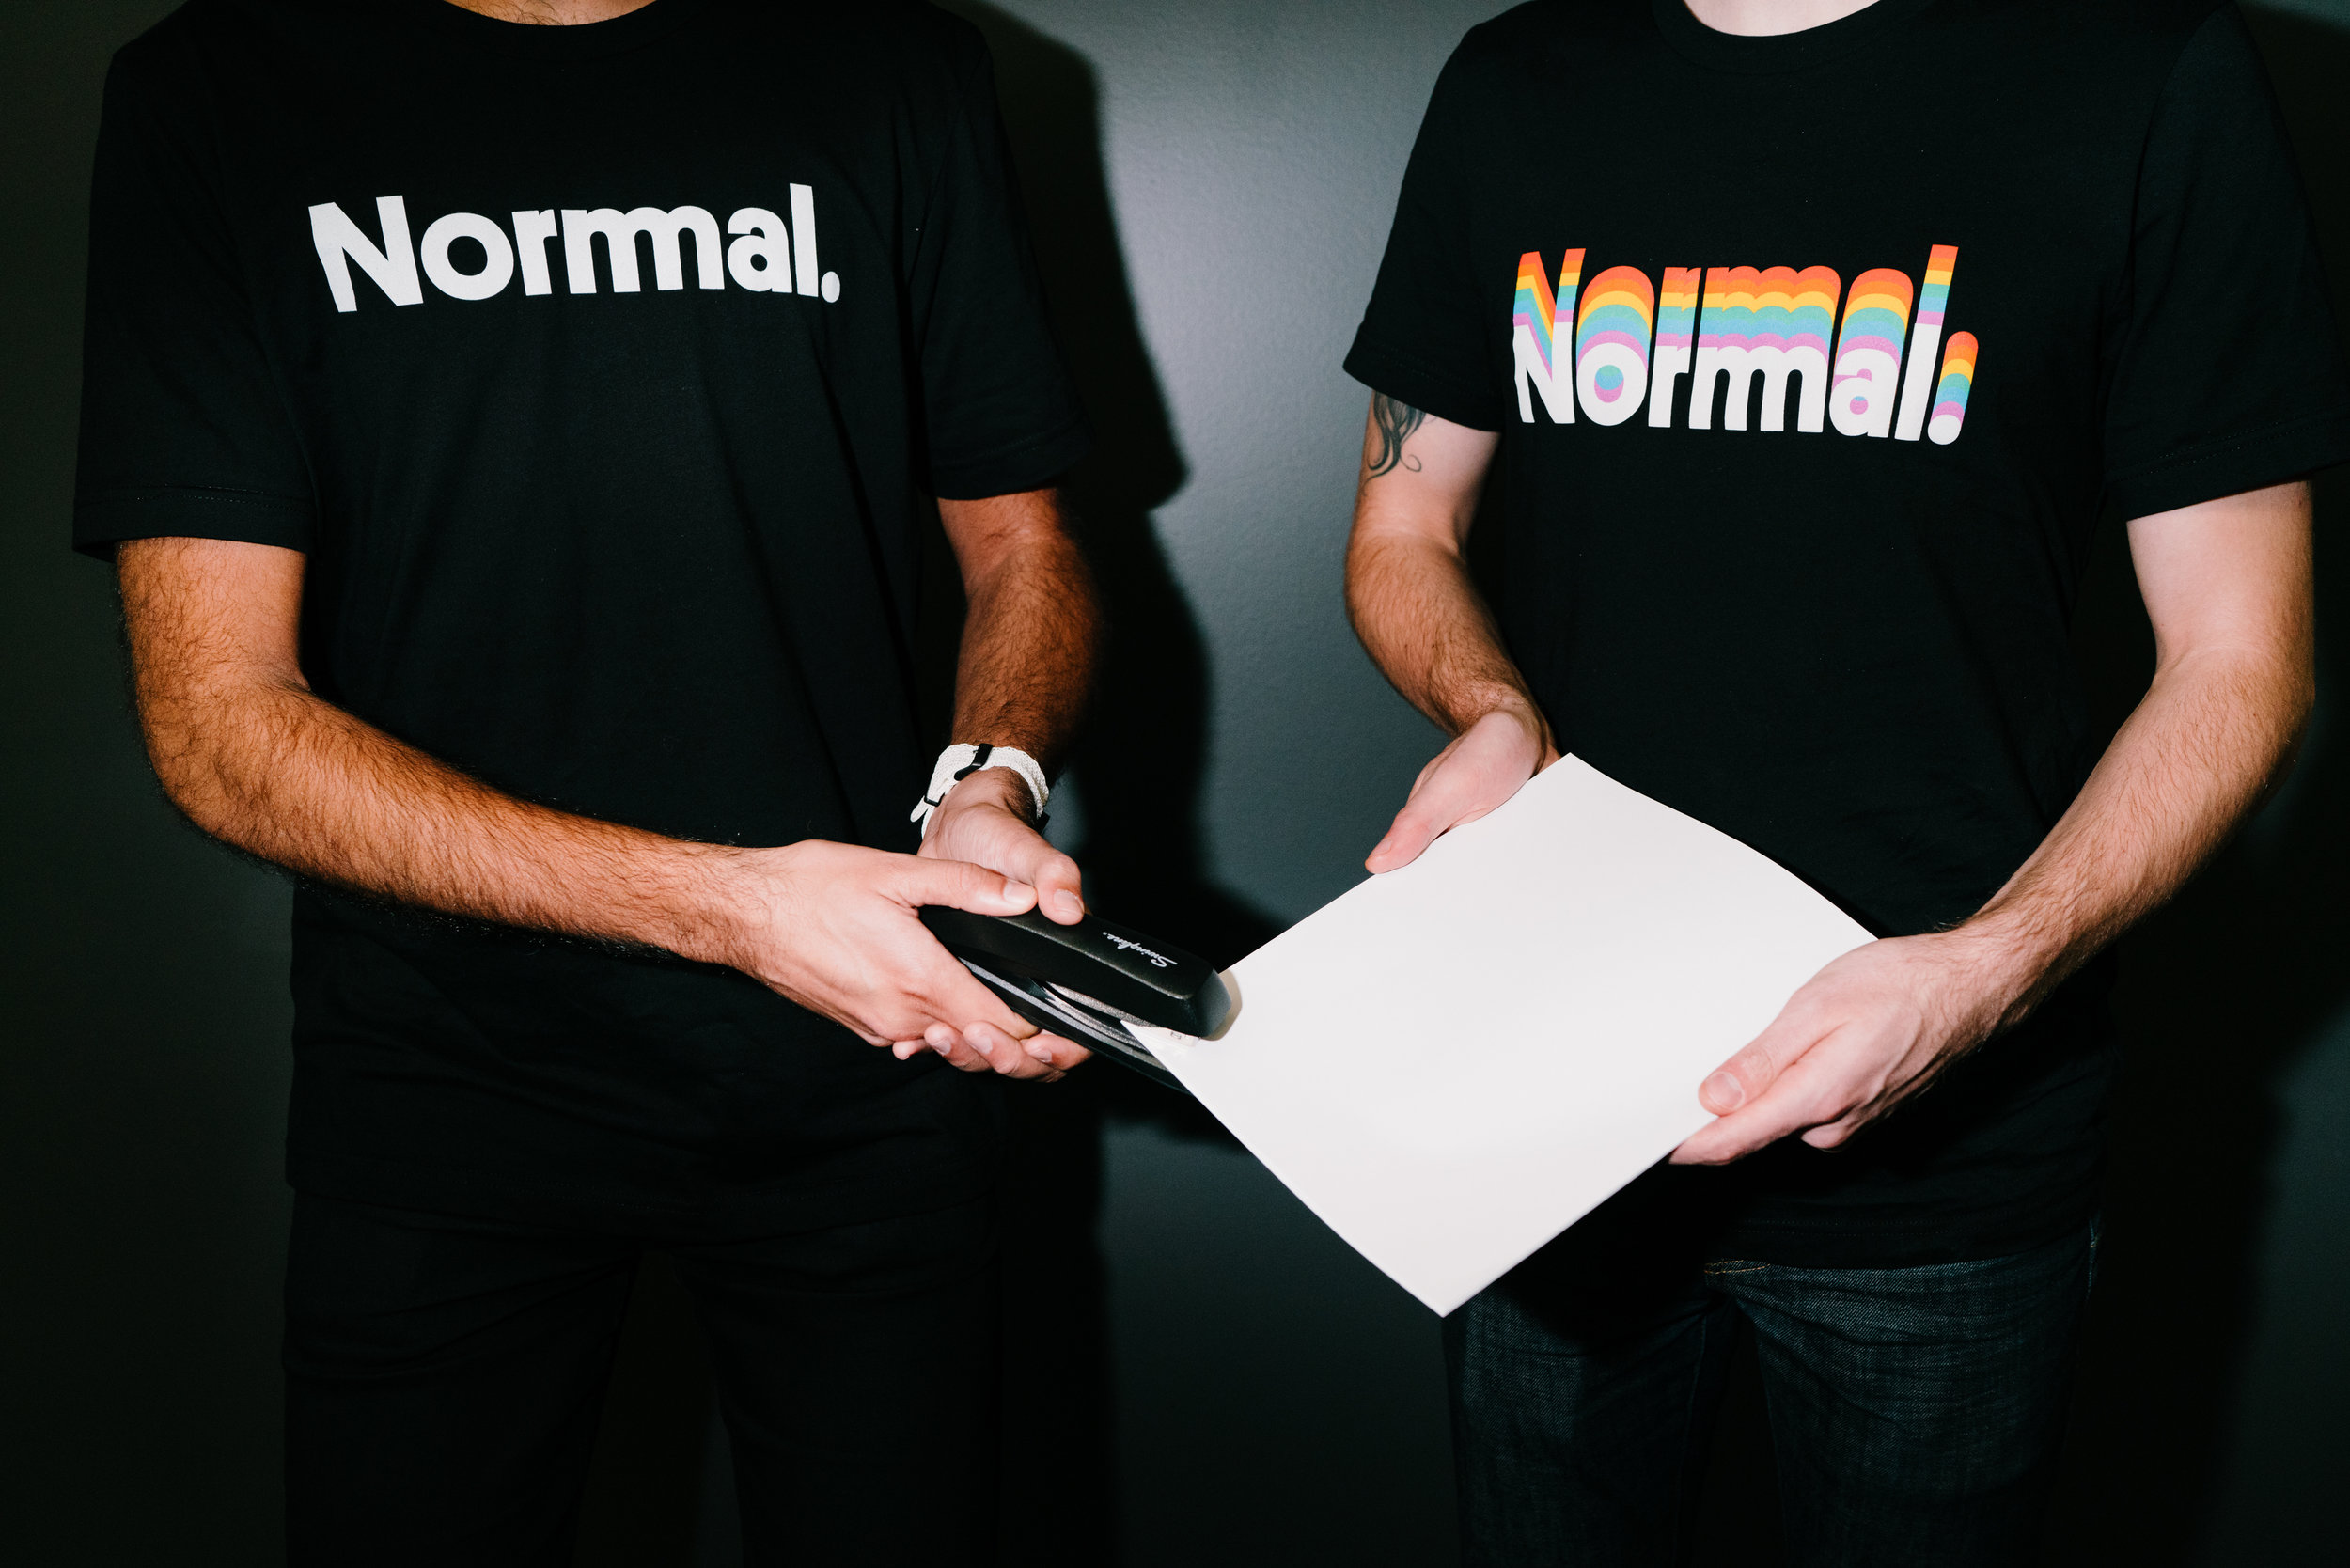 normalvr_selects_16.jpg